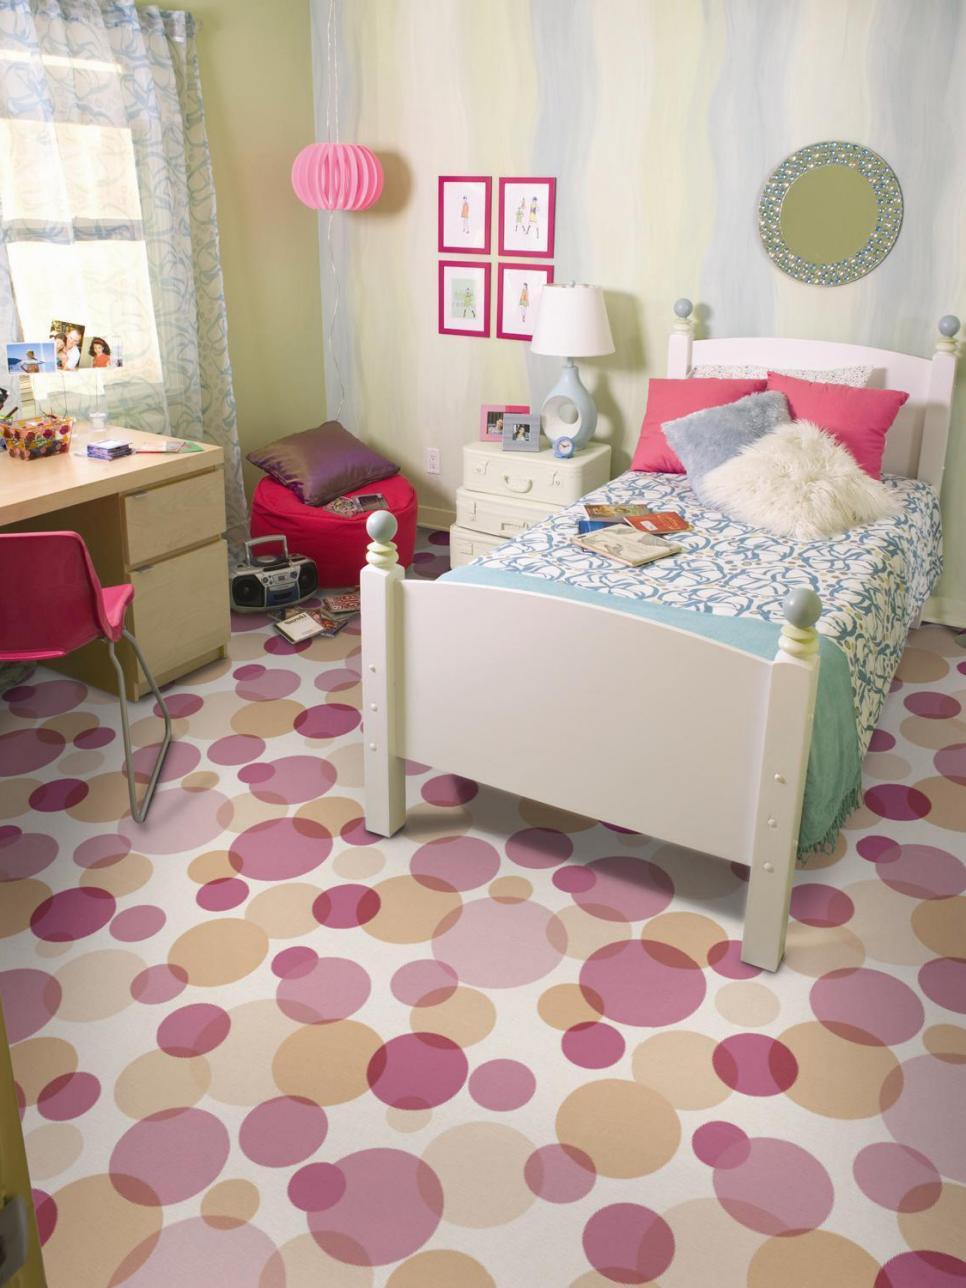 Playful kids 39 rooms designs hgtv for Kids room flooring